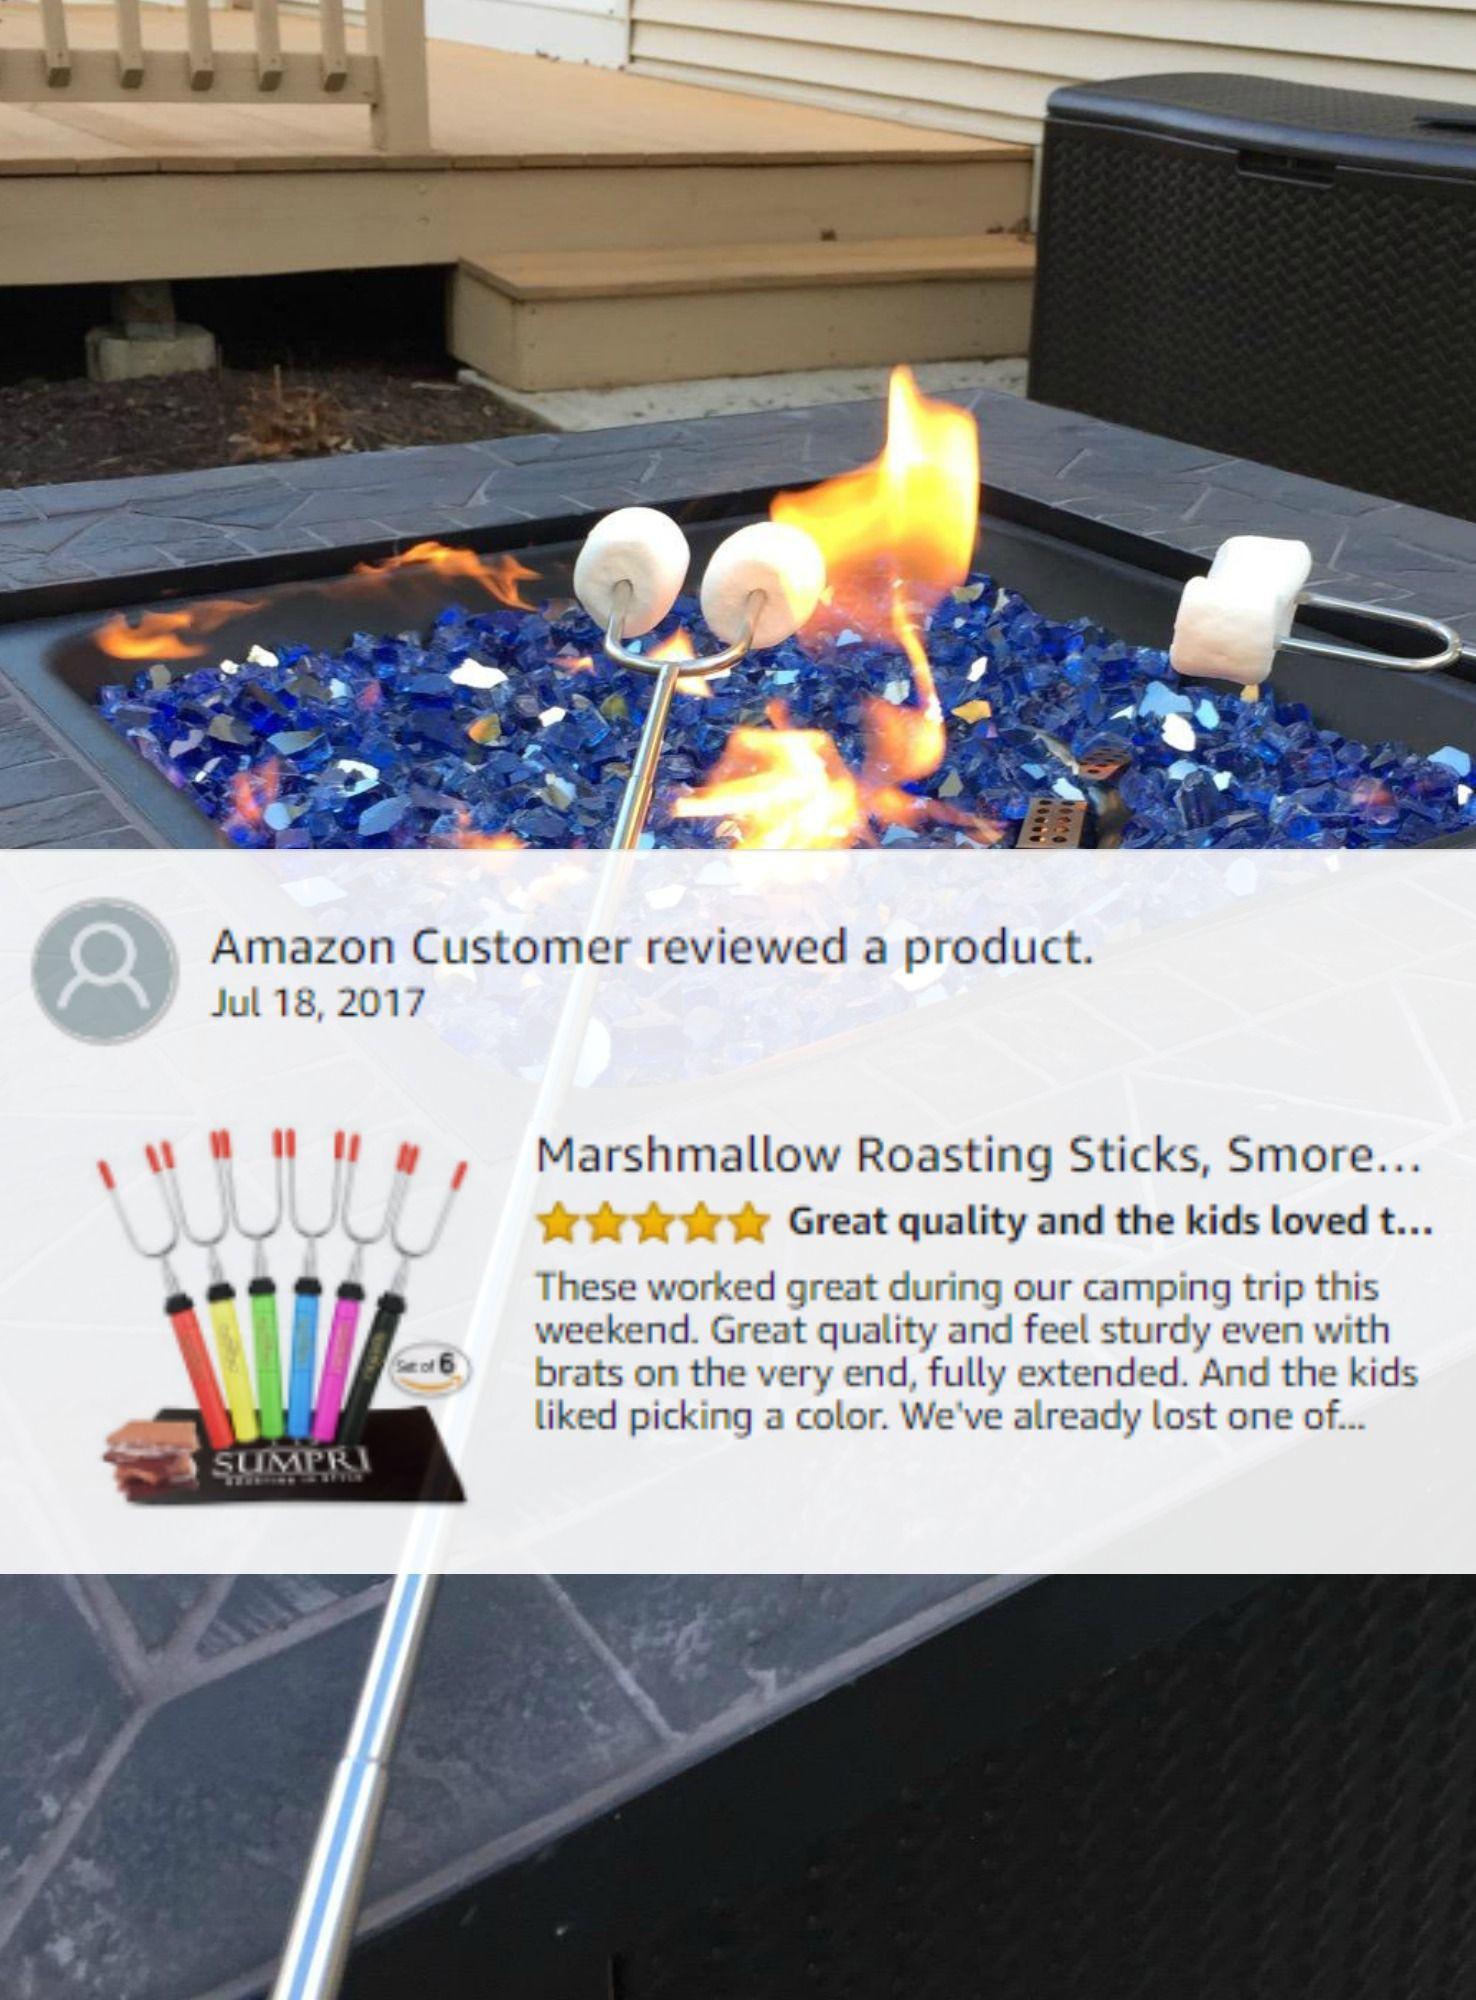 sumpri barbeqa marshmallow roasting sticks telescoping extra long 34